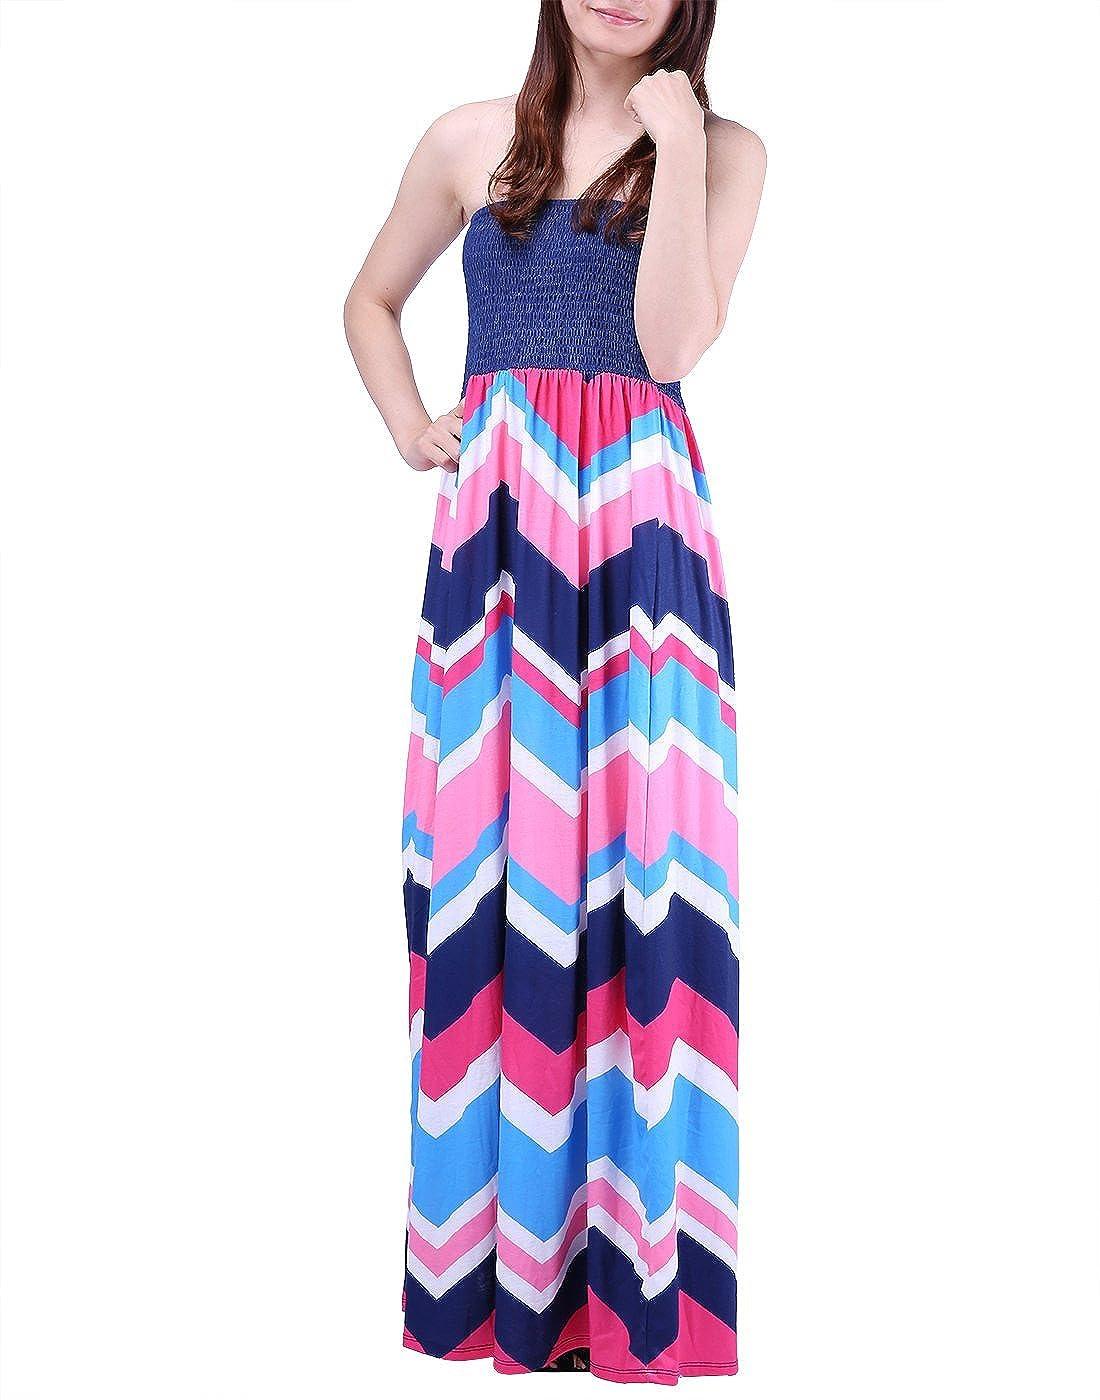 0fb4951f8fb Amazon.com  HDE Women s Strapless Maxi Dress Plus Size Tube Top Long Skirt  Sundress Cover Up (Pink Blue Chevron